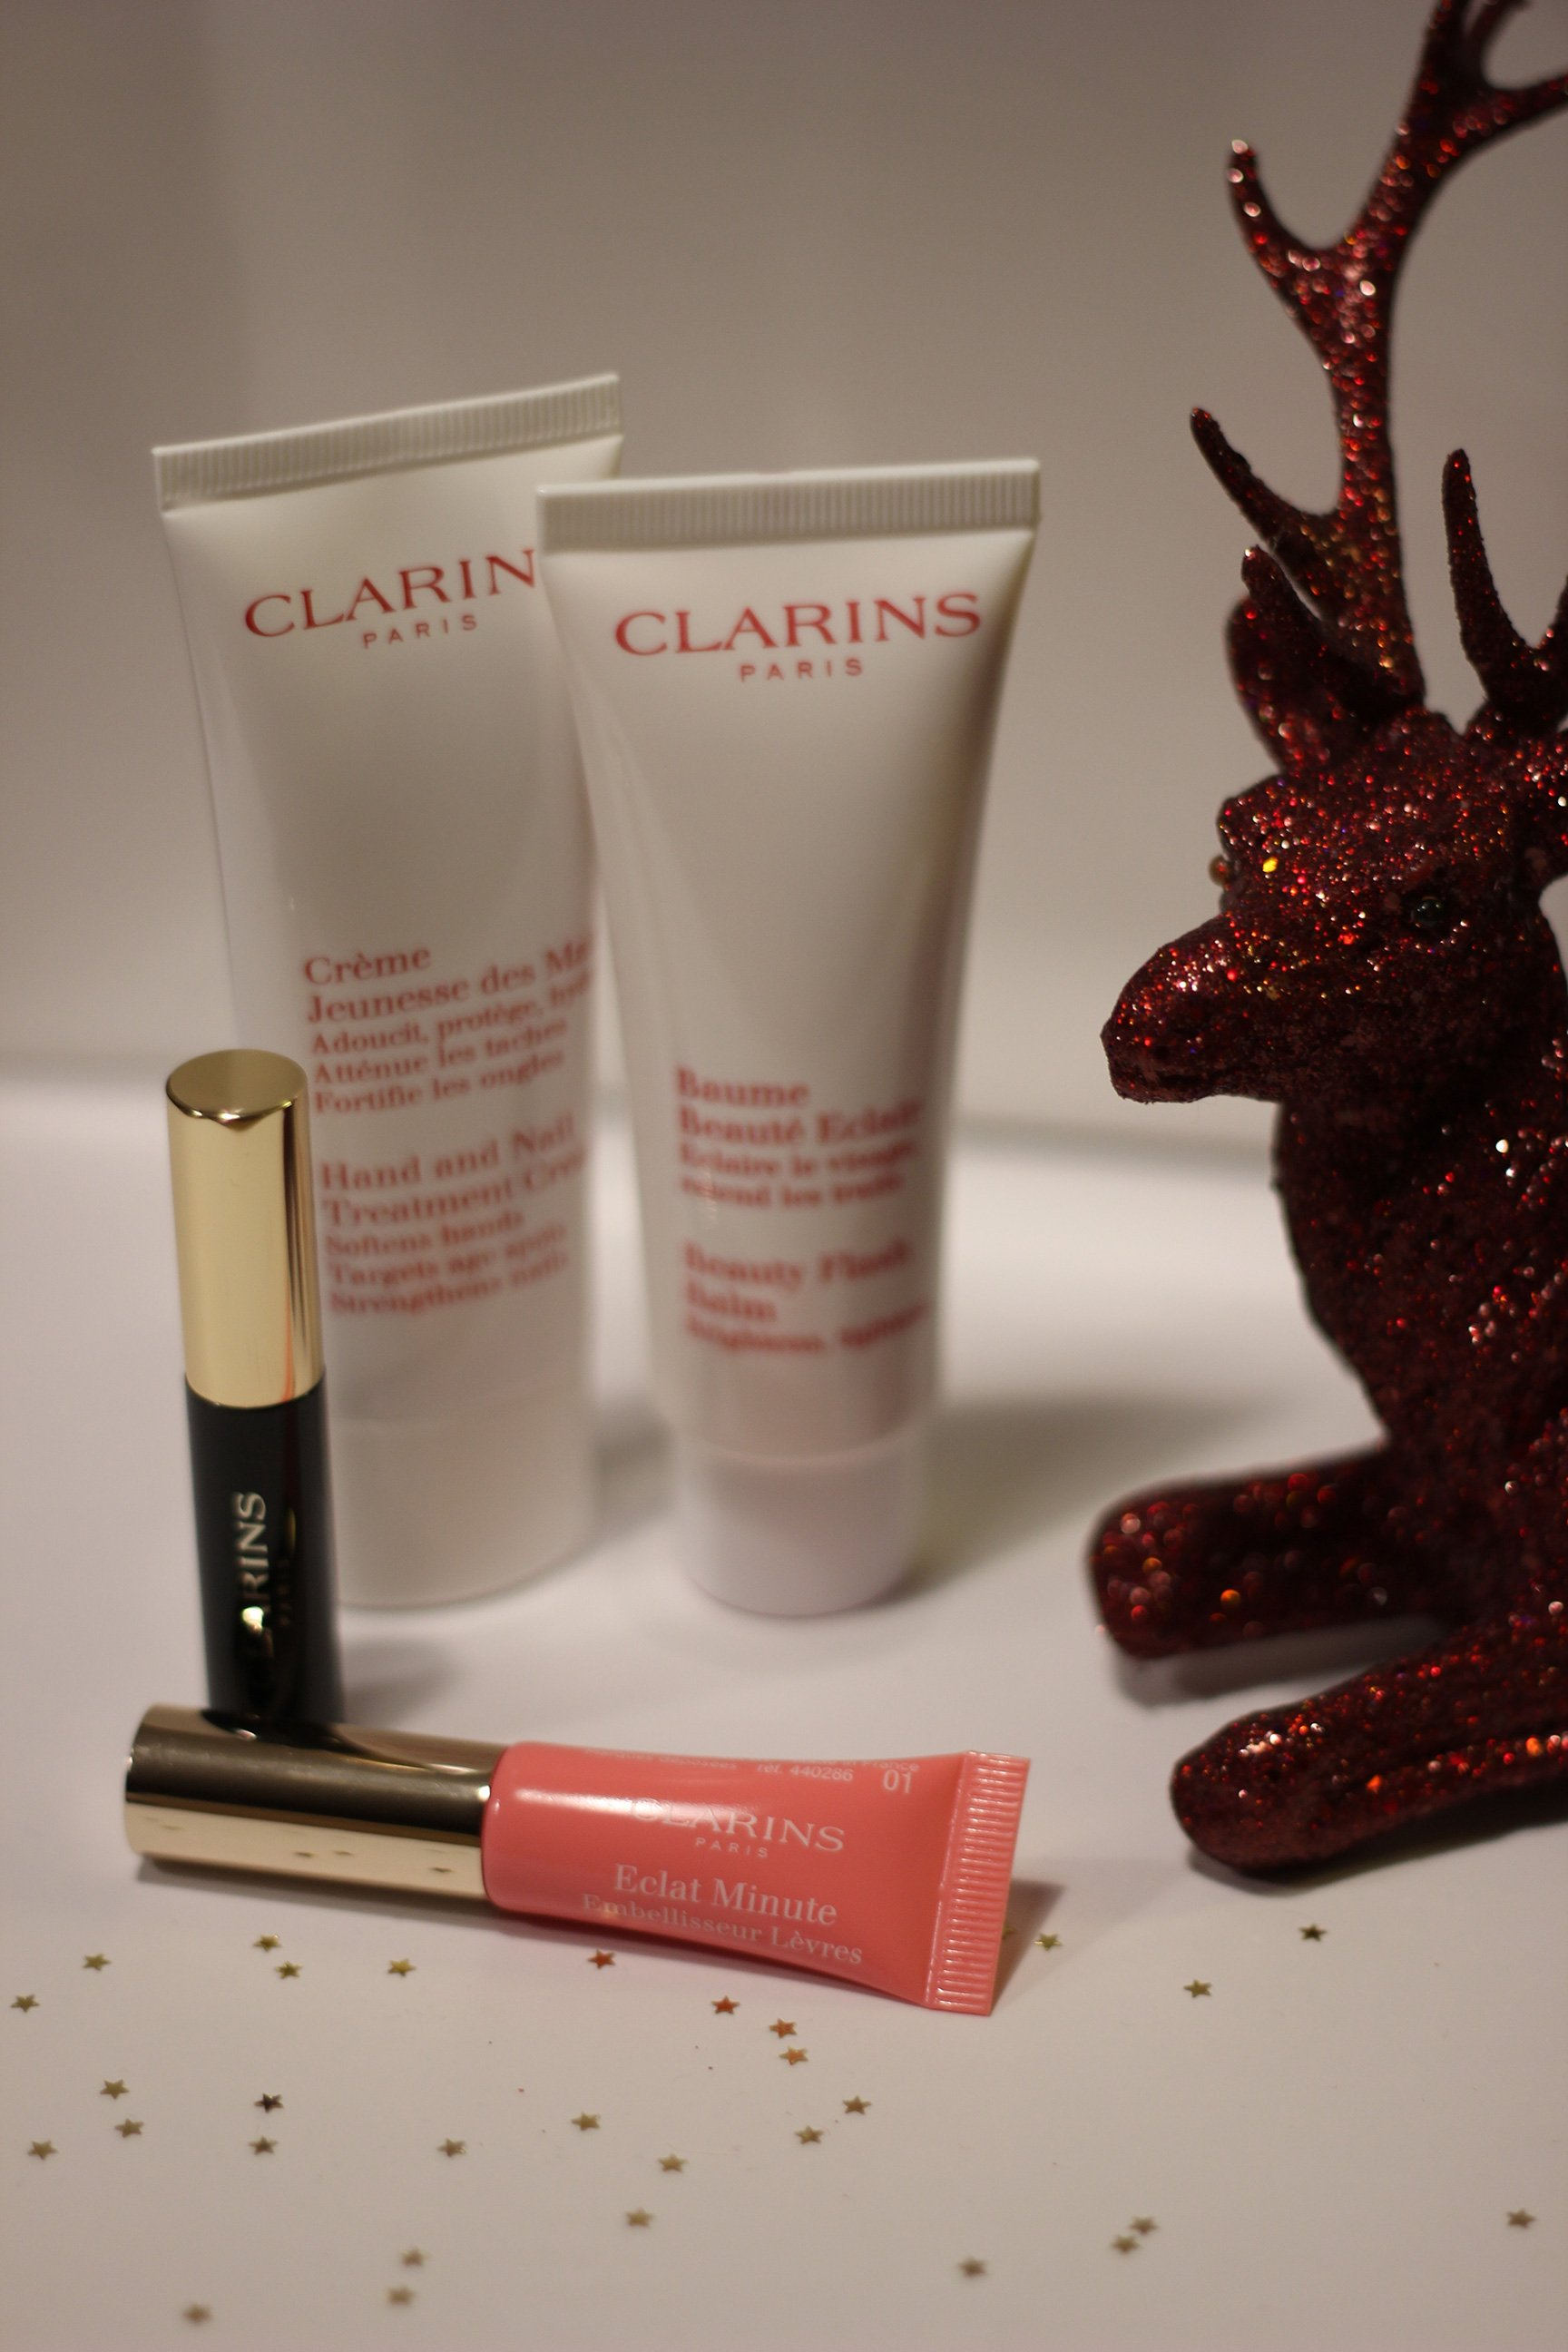 IMG_9032_Clarins_BeautyFlashBalm_Wimperntusche_Lipbalm_Handcreme